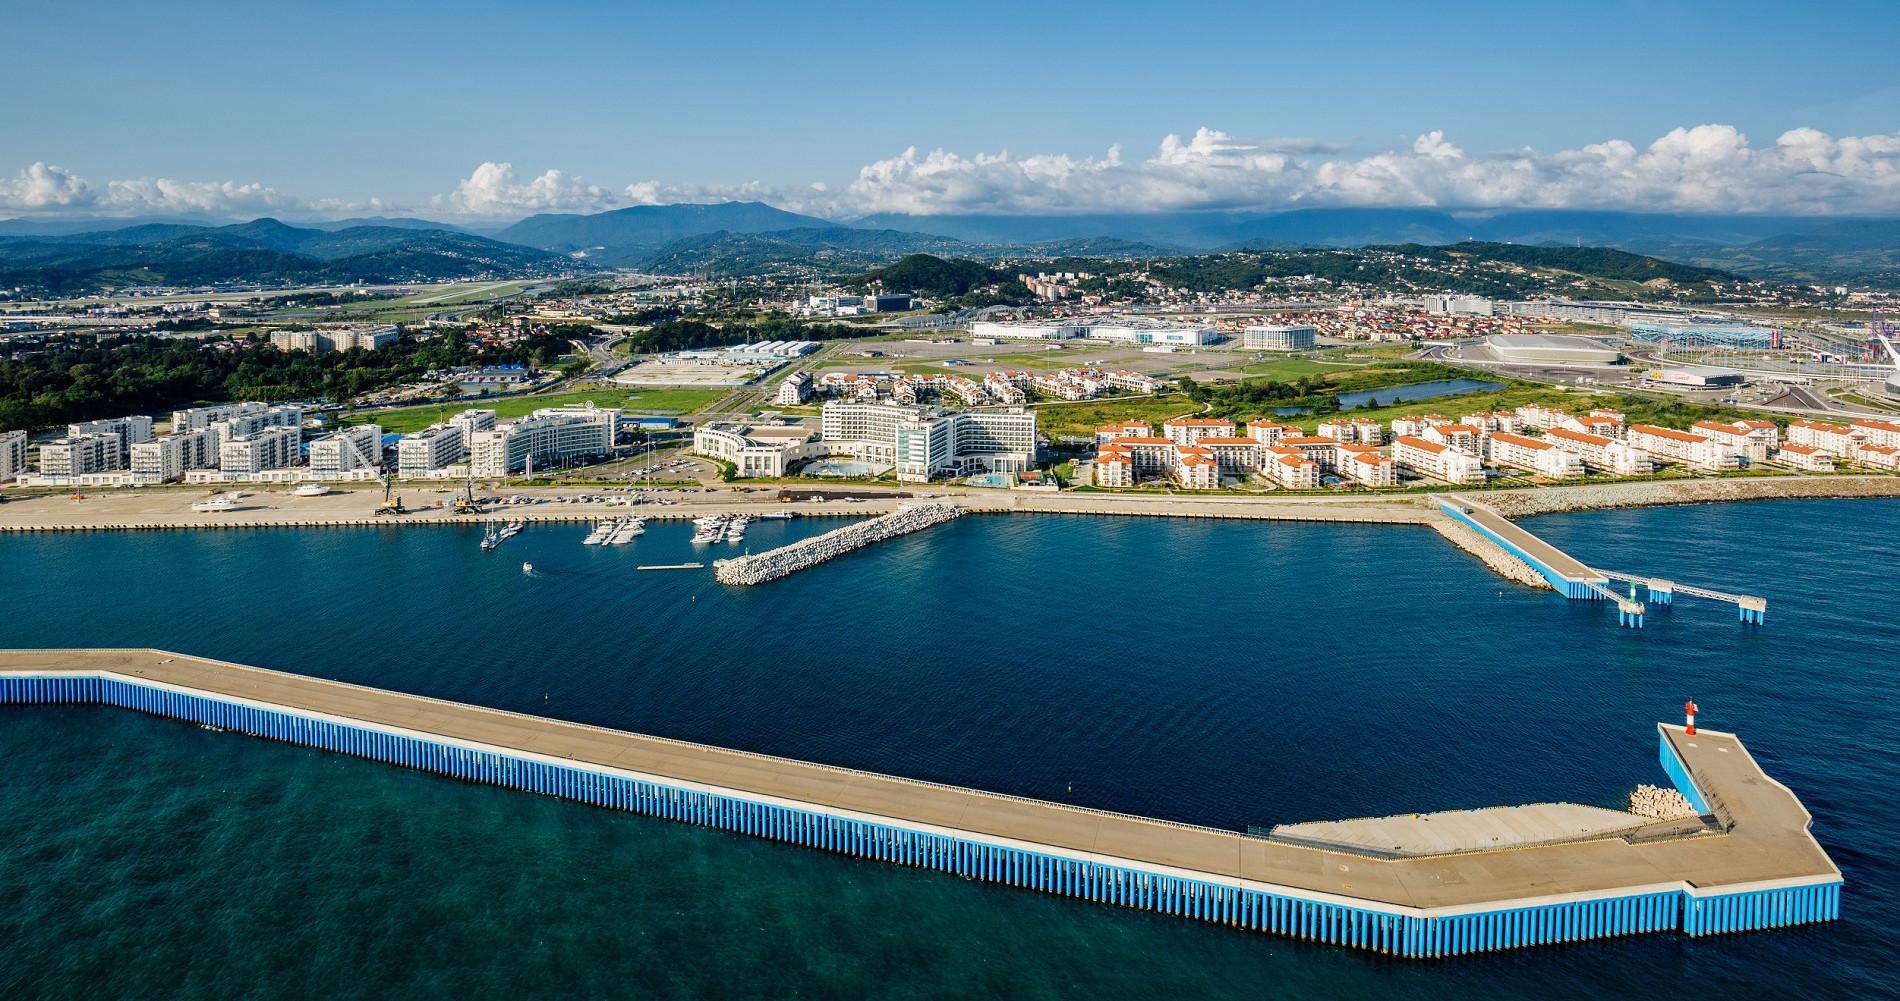 Вид с моря на отели Имеретинского курорта Сочи